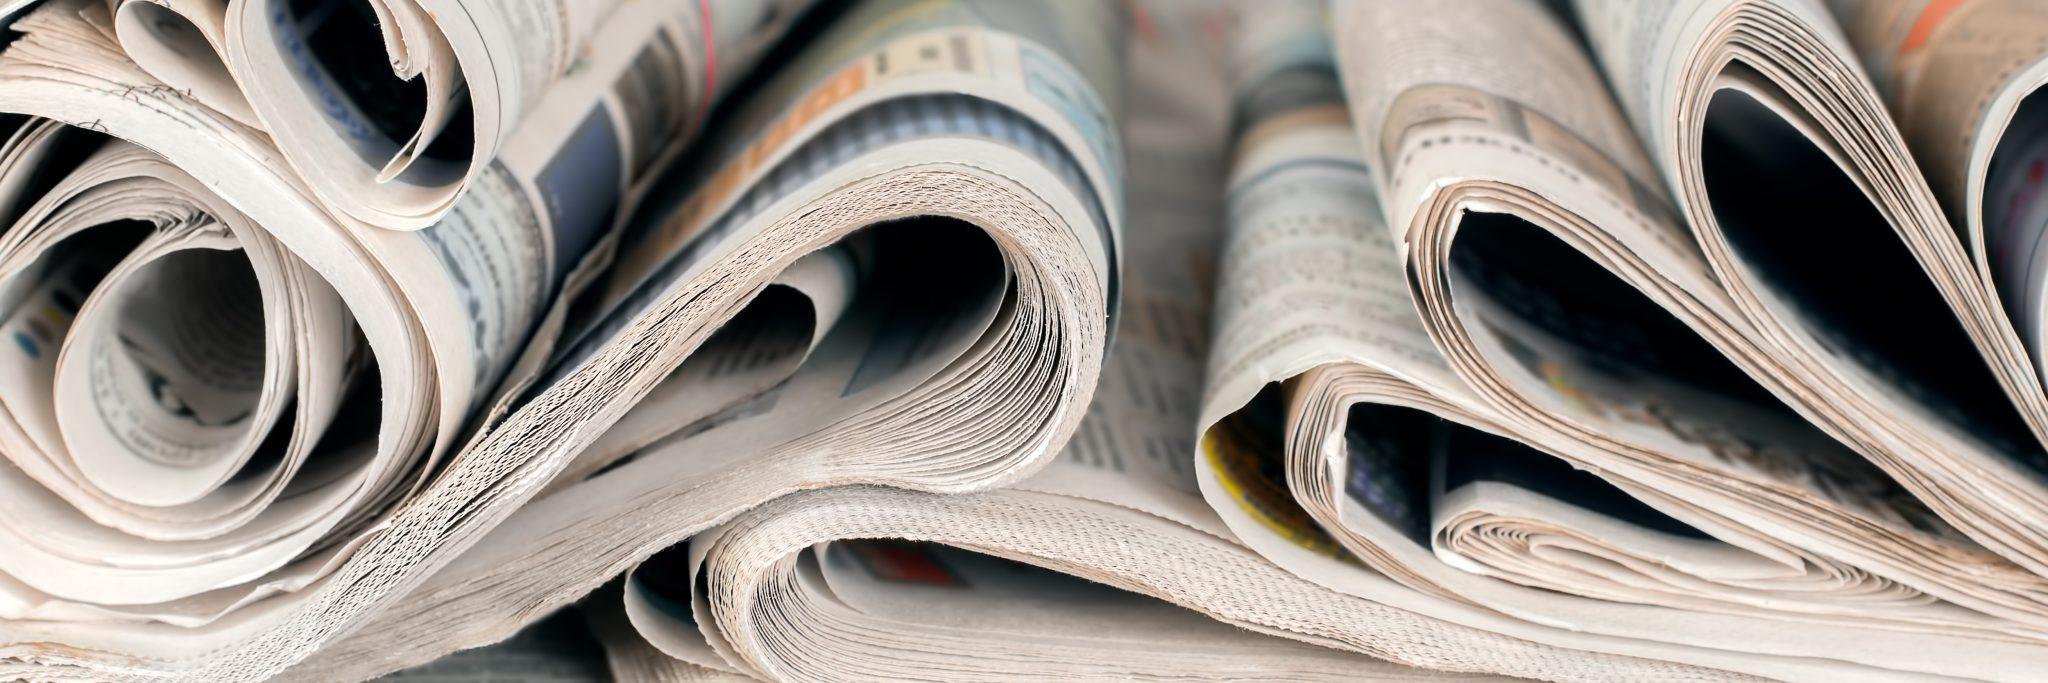 Close-up panoramic of newspapers